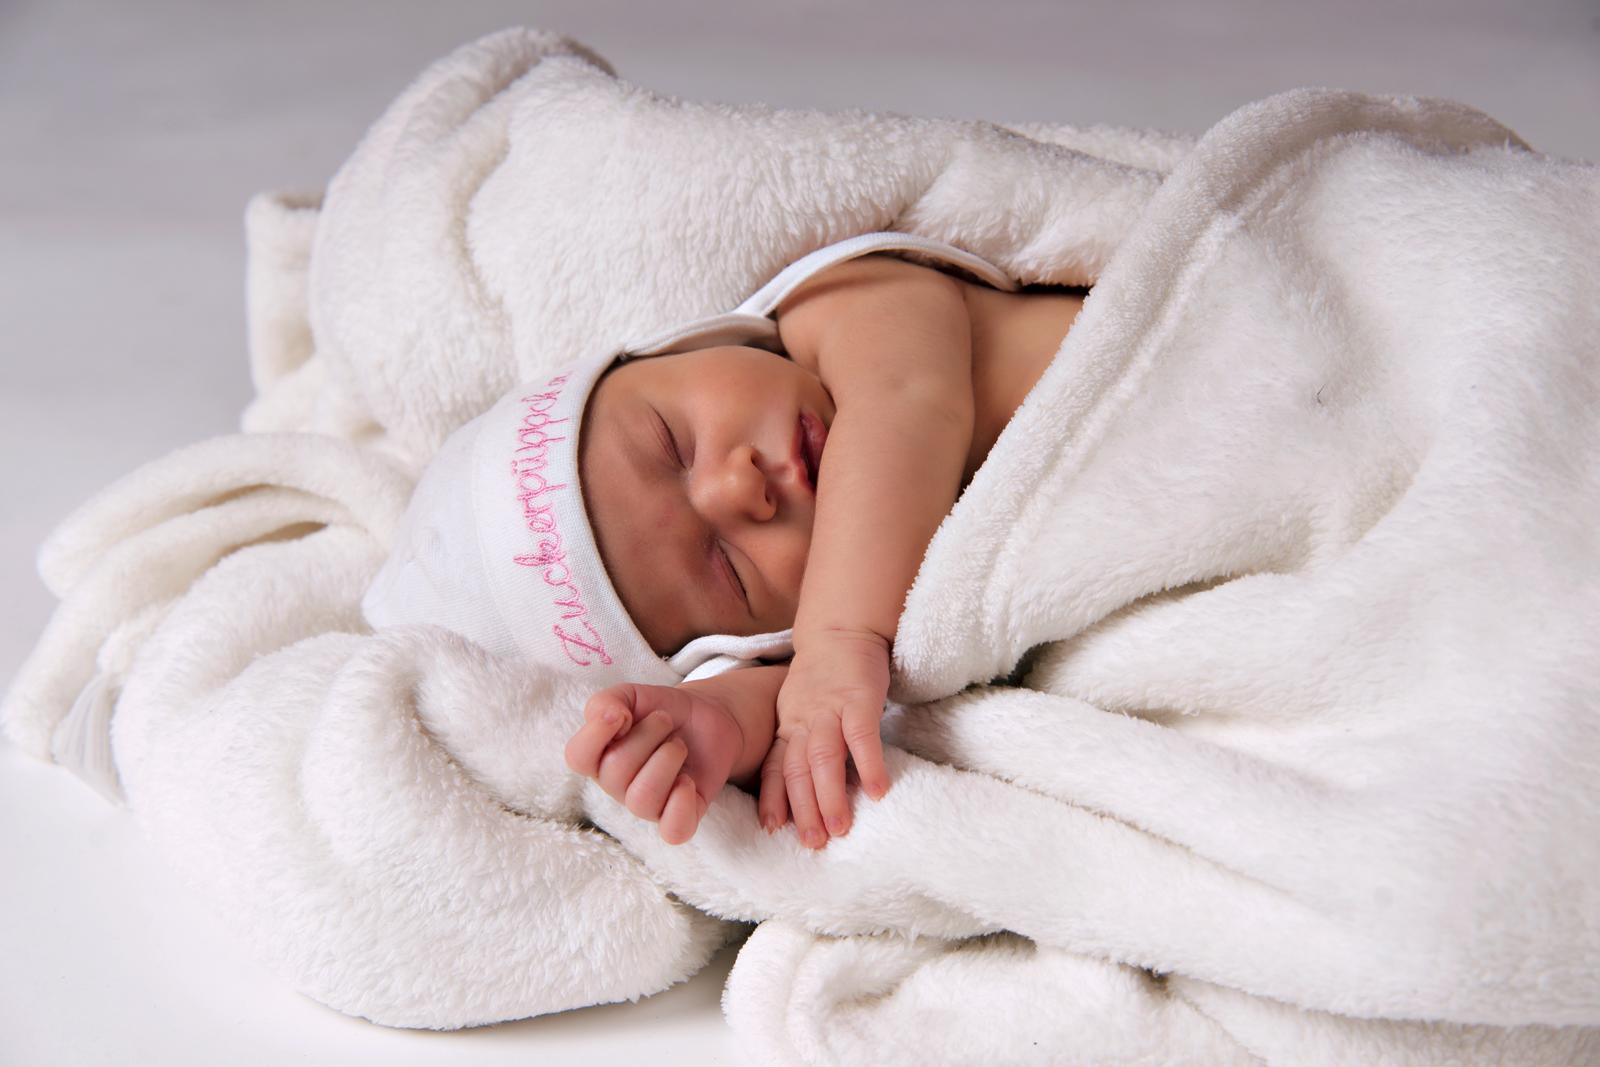 Newborn-Fotoshooting-13